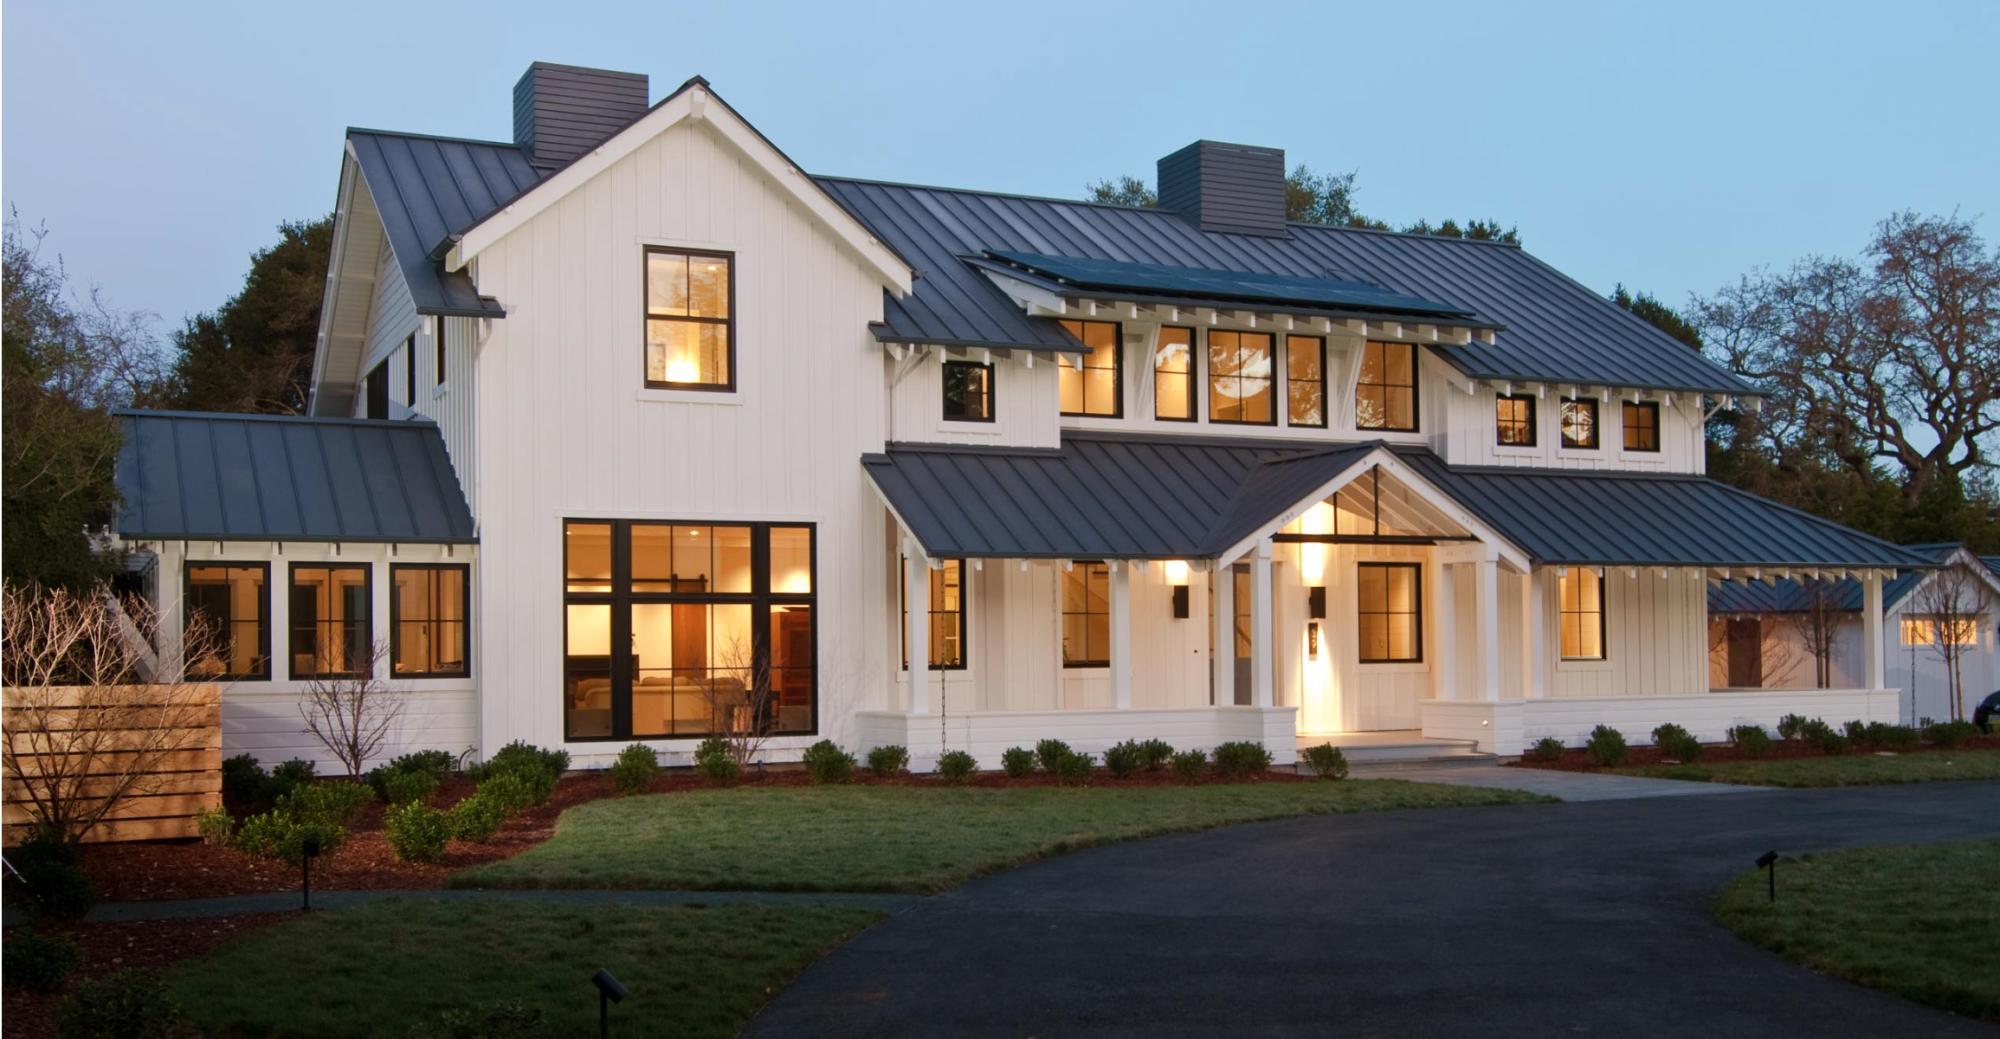 Modern Farmhouse by Redbud Custom Homes   Houzz Picks   House and ...